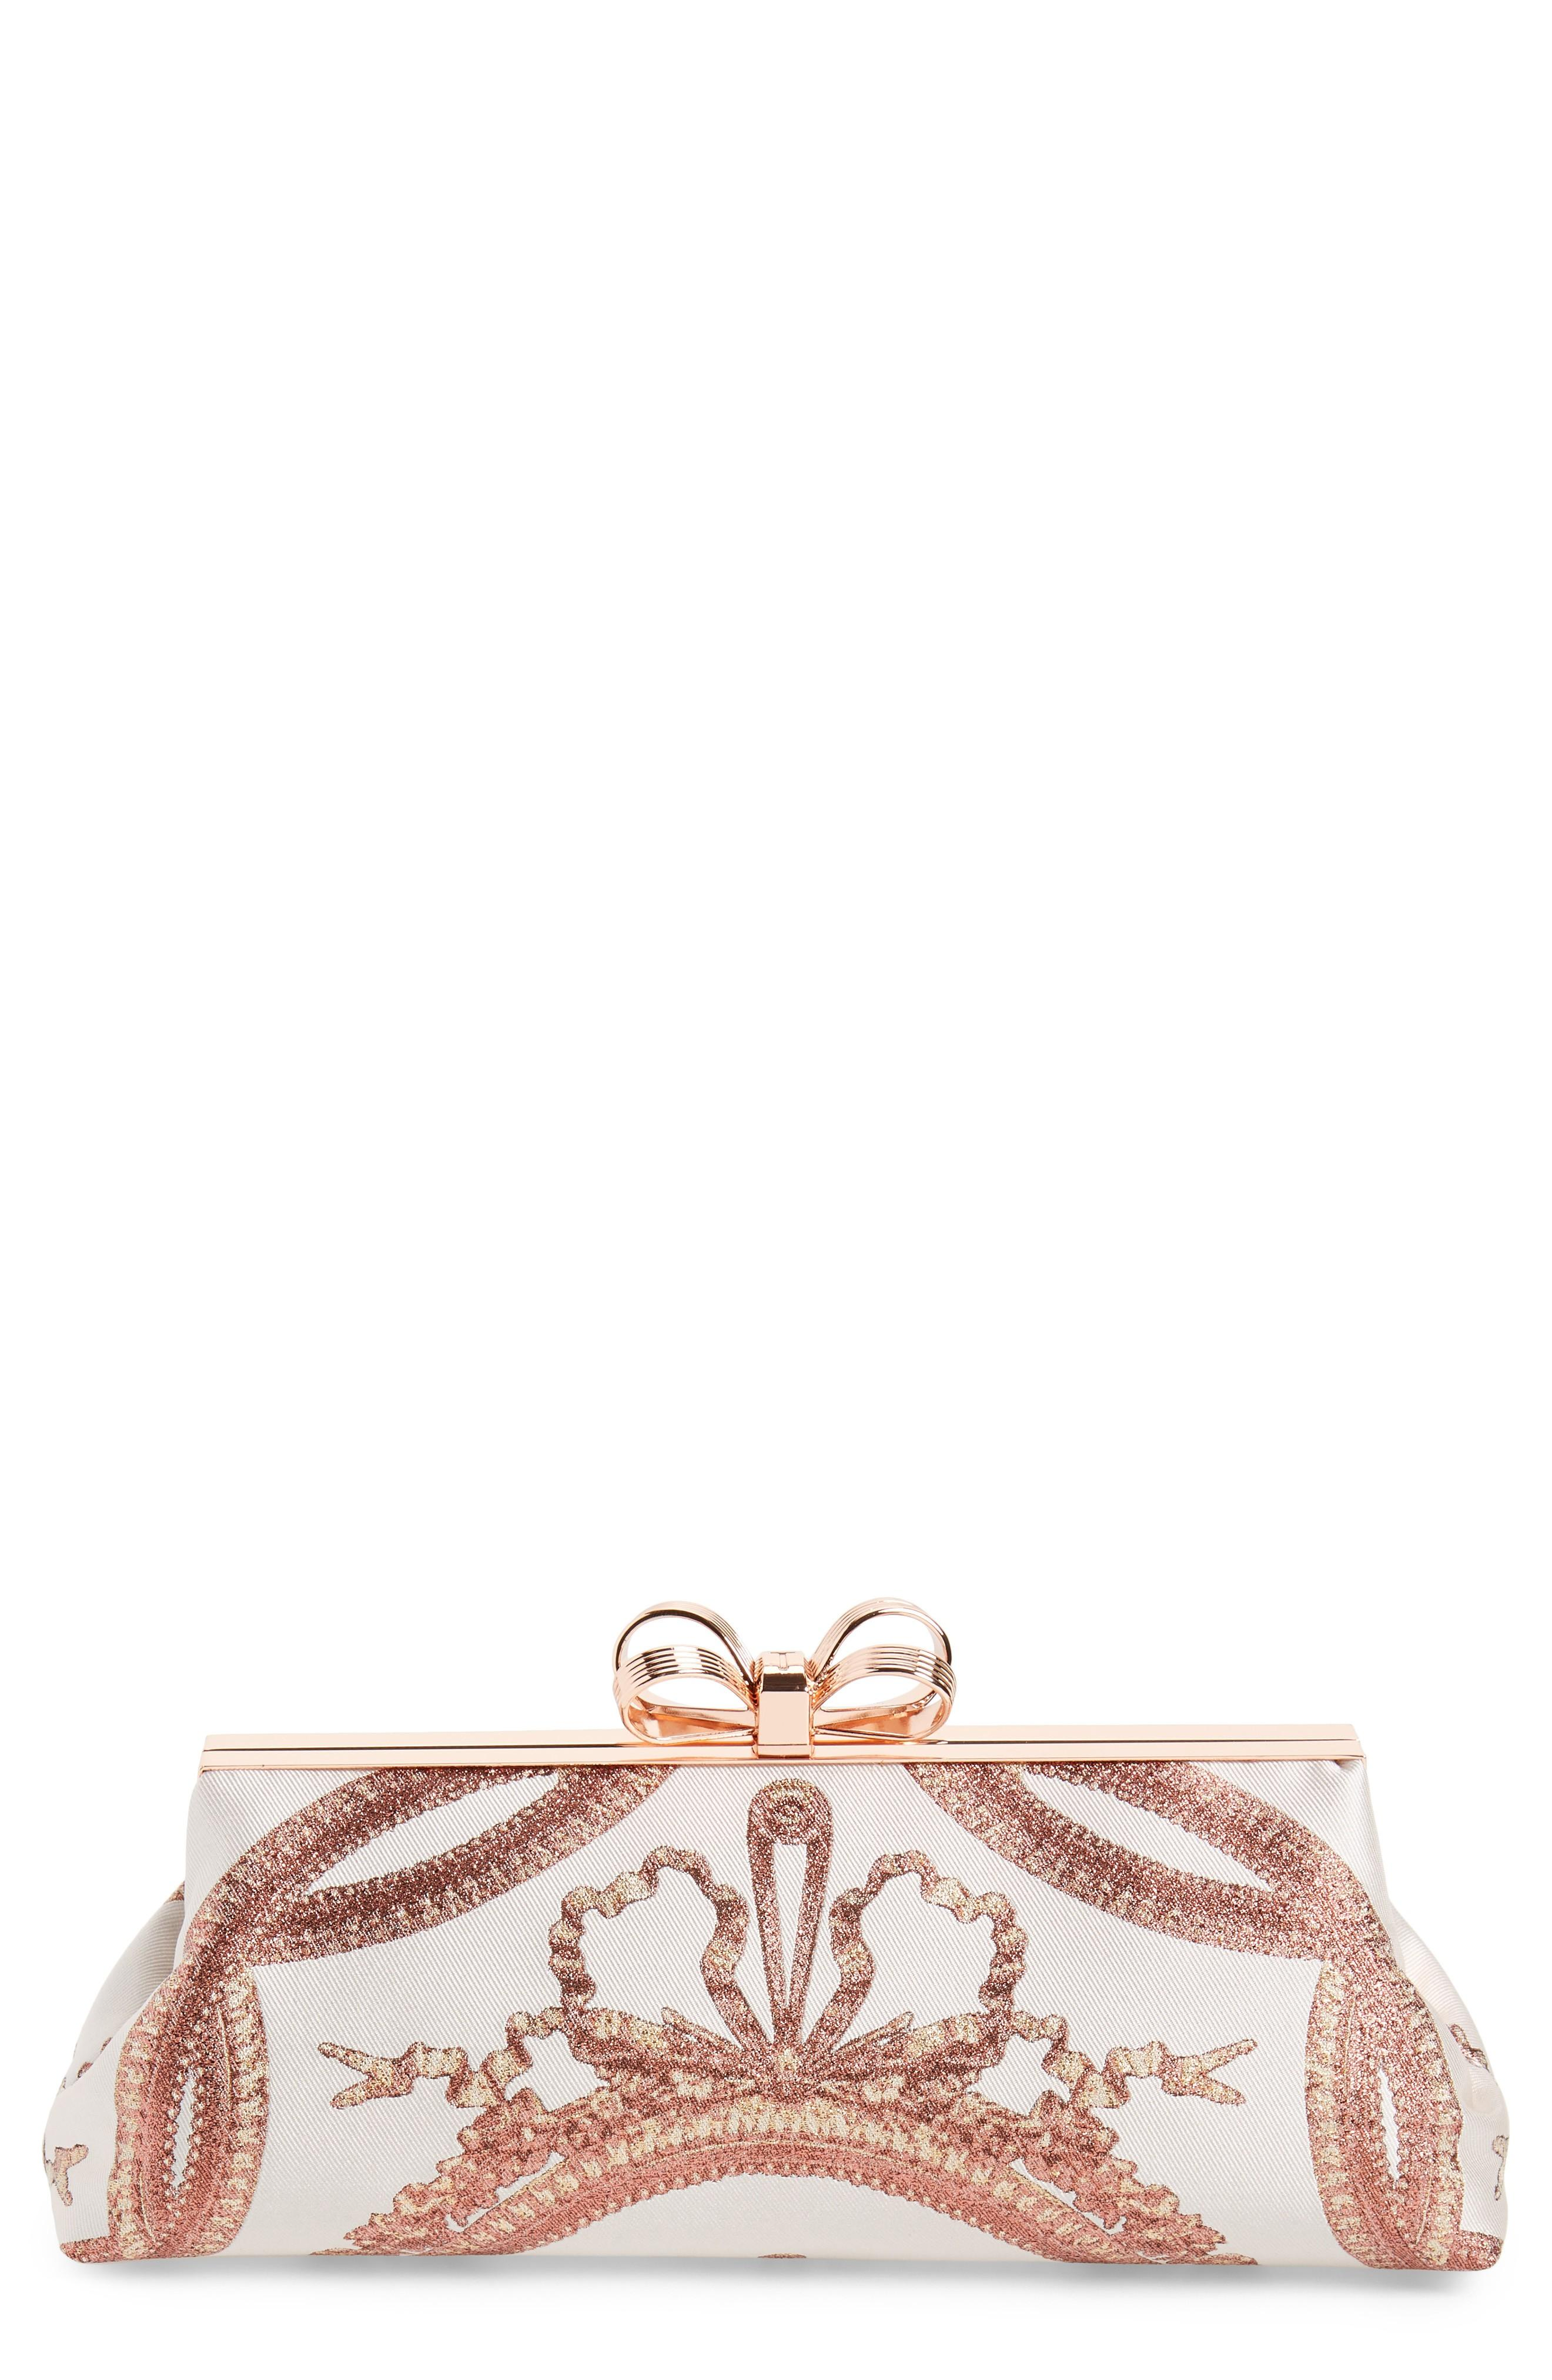 6d24ed03dc Ted Baker Karlii - Versailles Print Frame Clutch - Pink In Dusky Pink